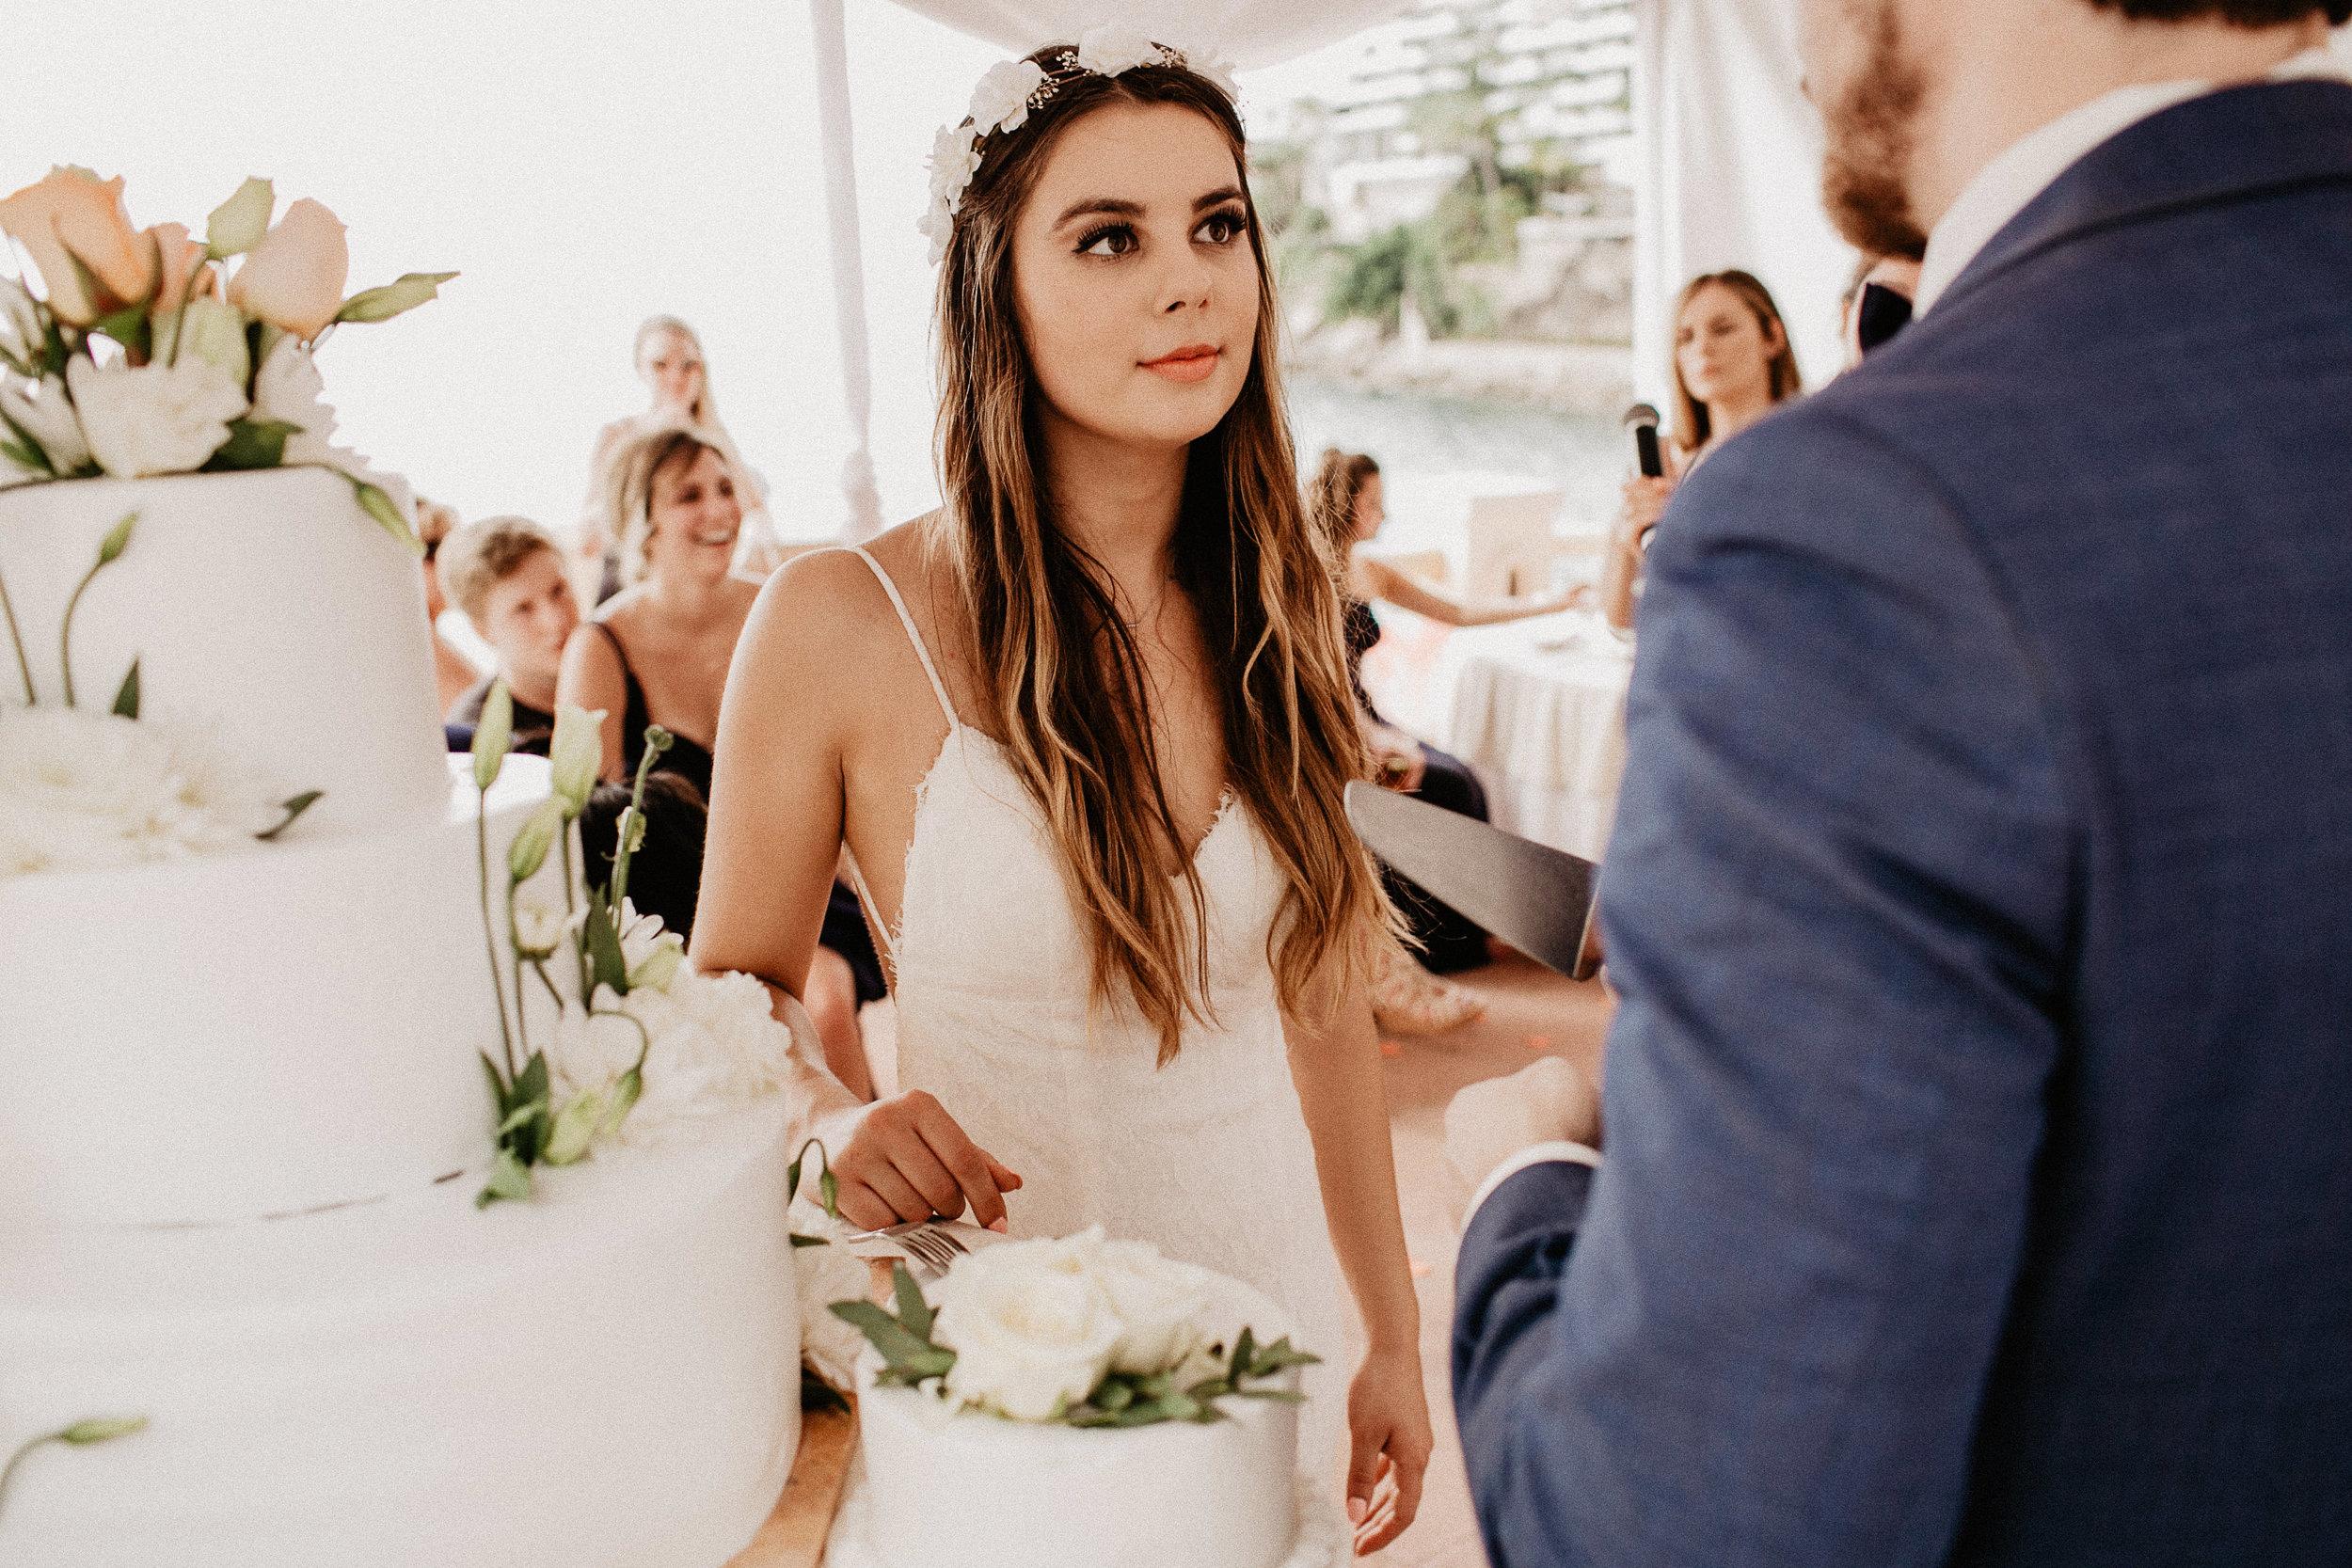 alfonso_flores_destination_wedding_photography_puerto_vallarta_hotel_barcelo_vallarta_cuttler_amela-562.JPG